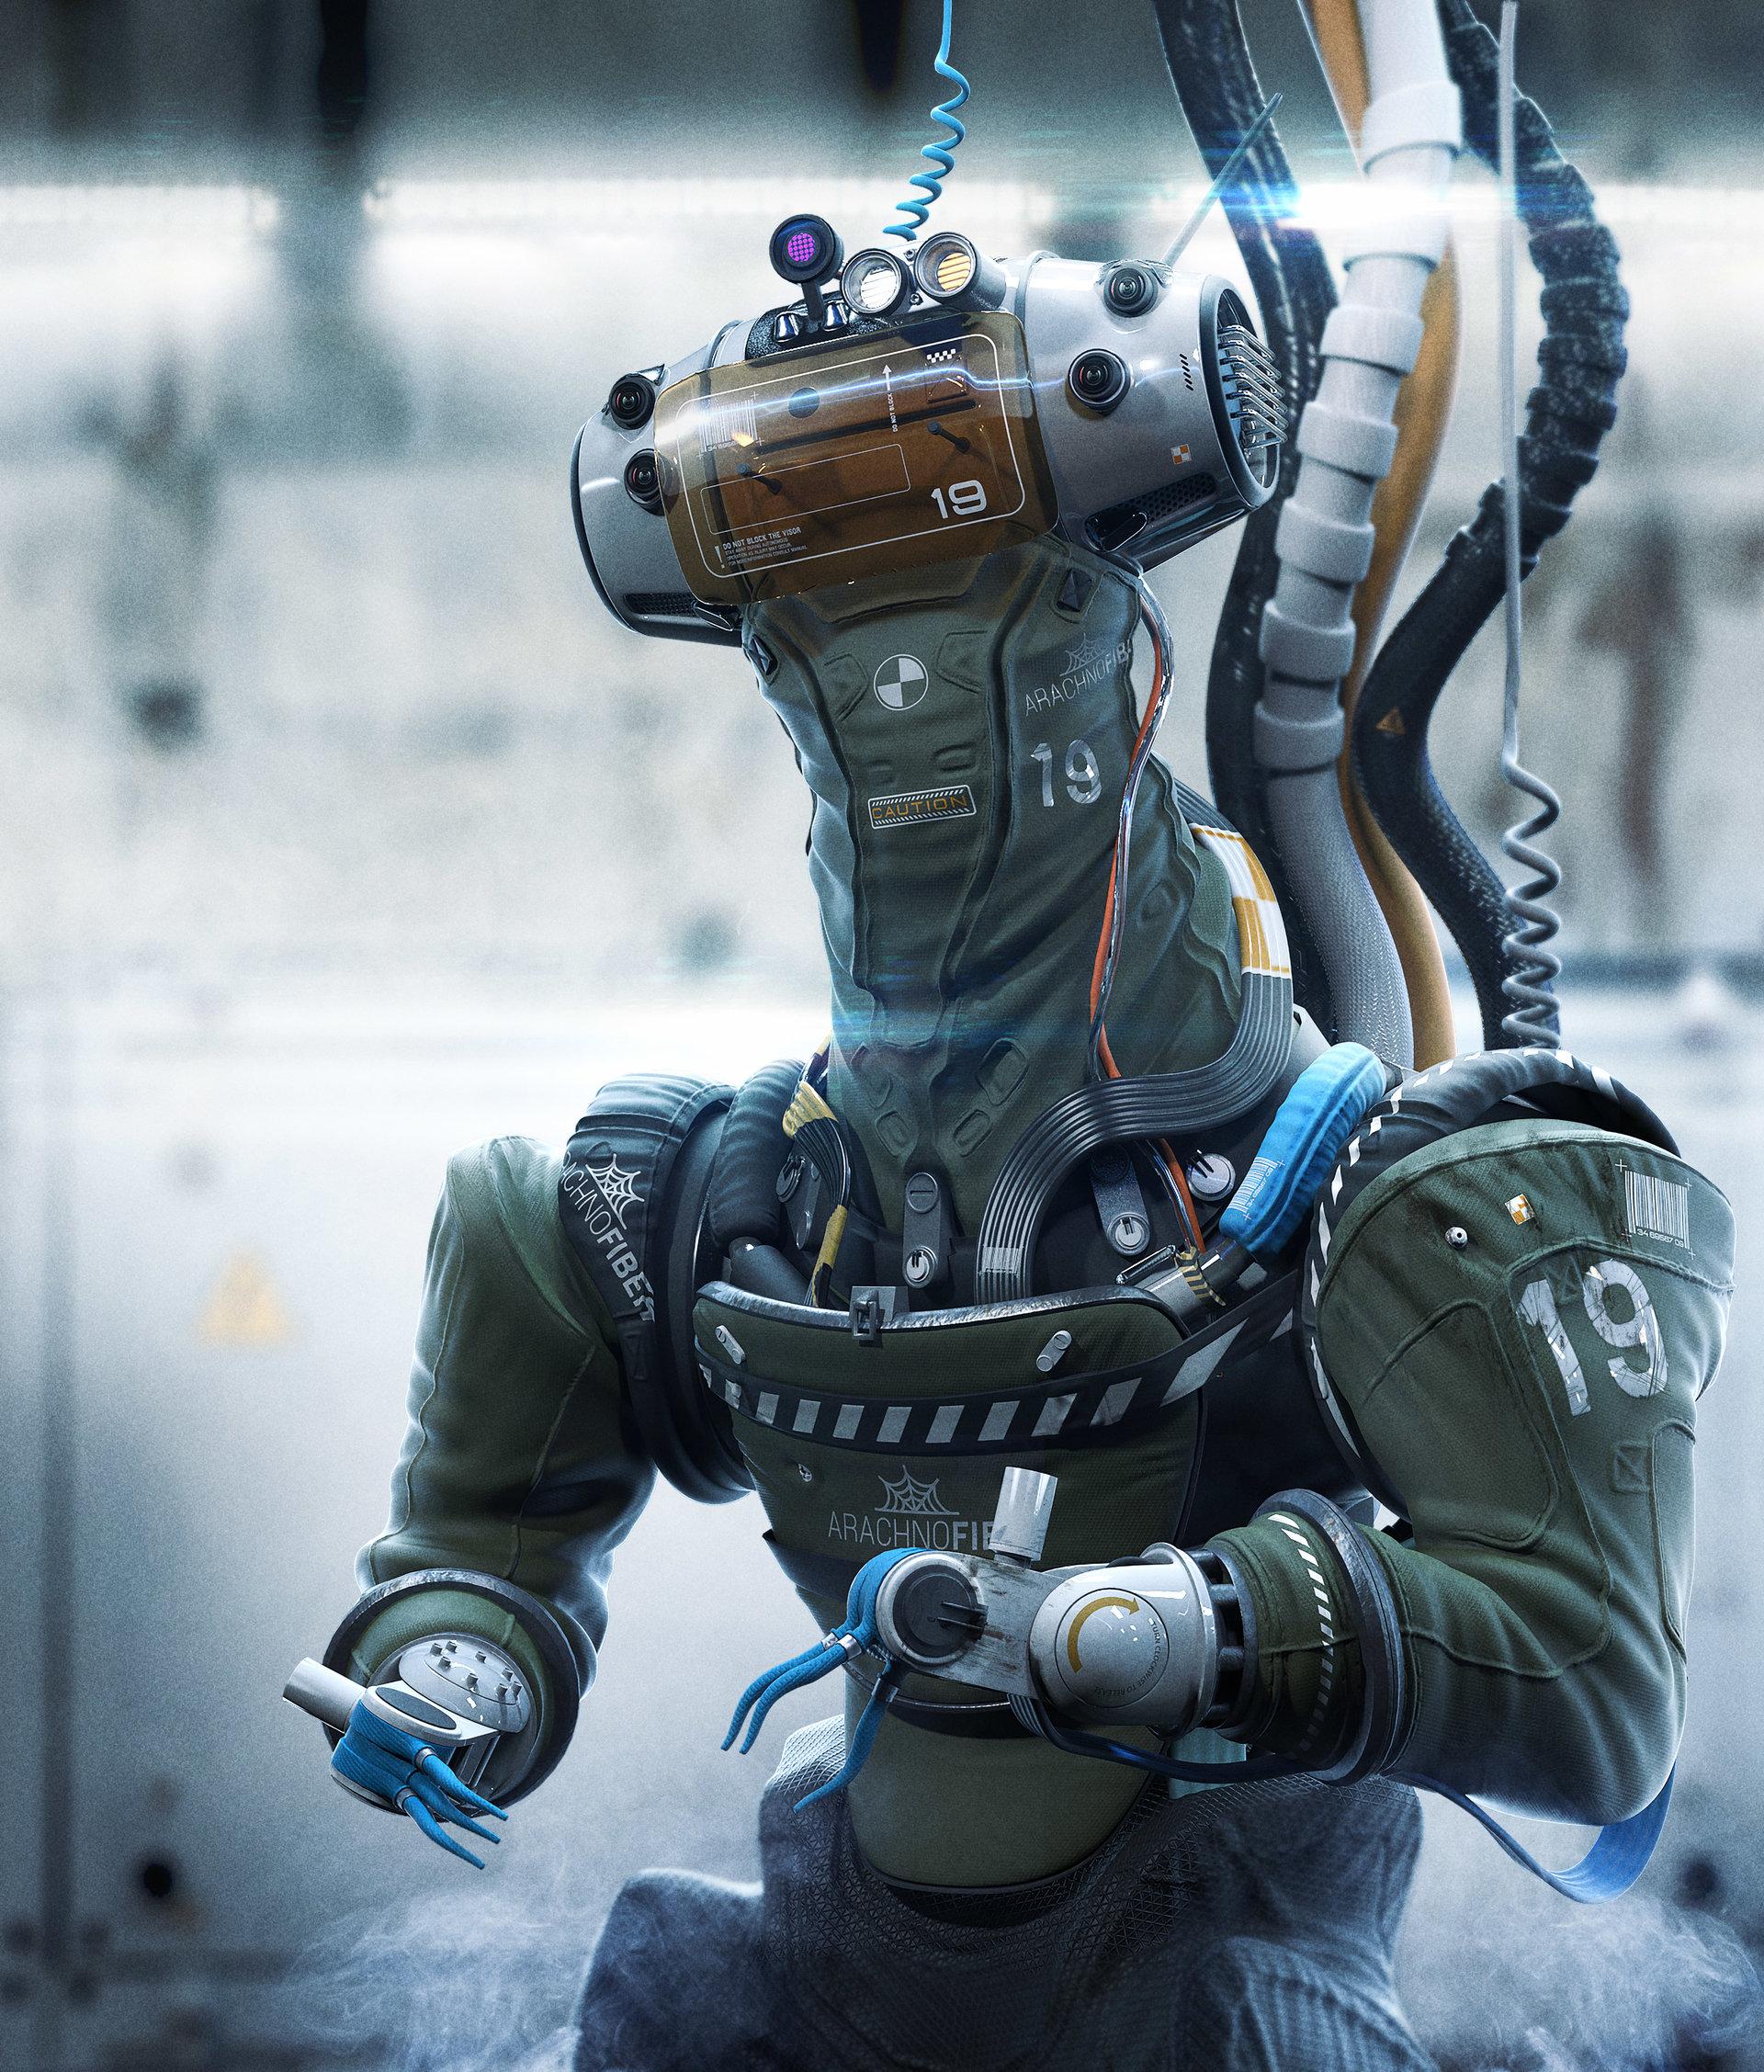 Igor sobolevsky robob hero